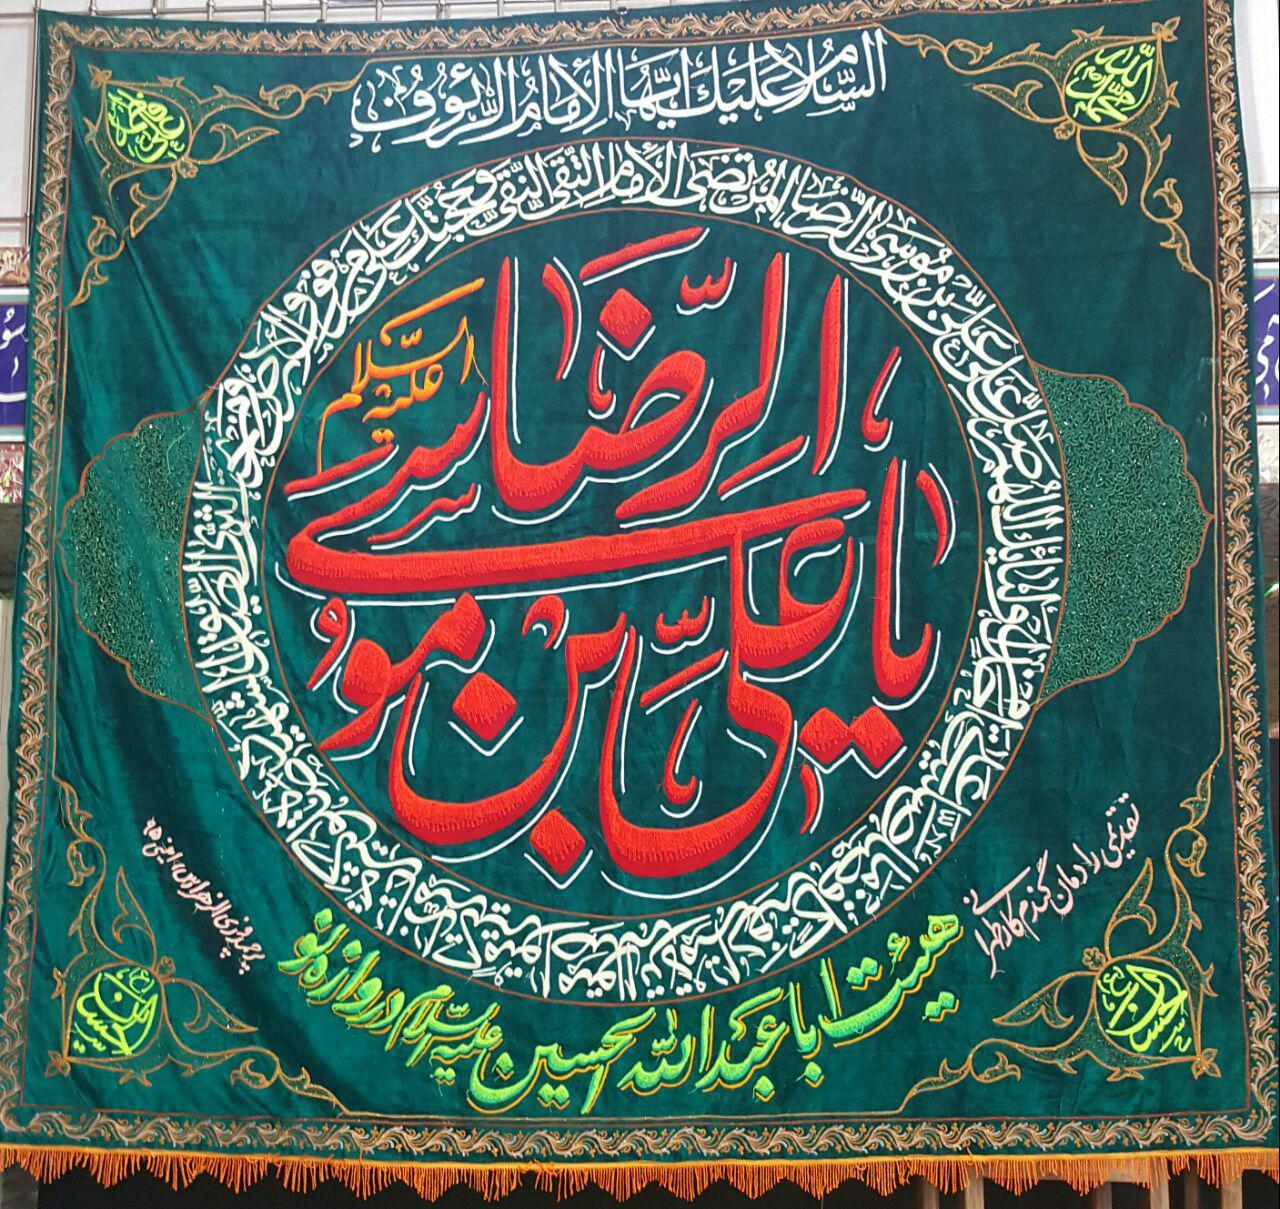 photo 2016 09 03 09 12 55 %پرچم دوزی الزهرا اصفهان